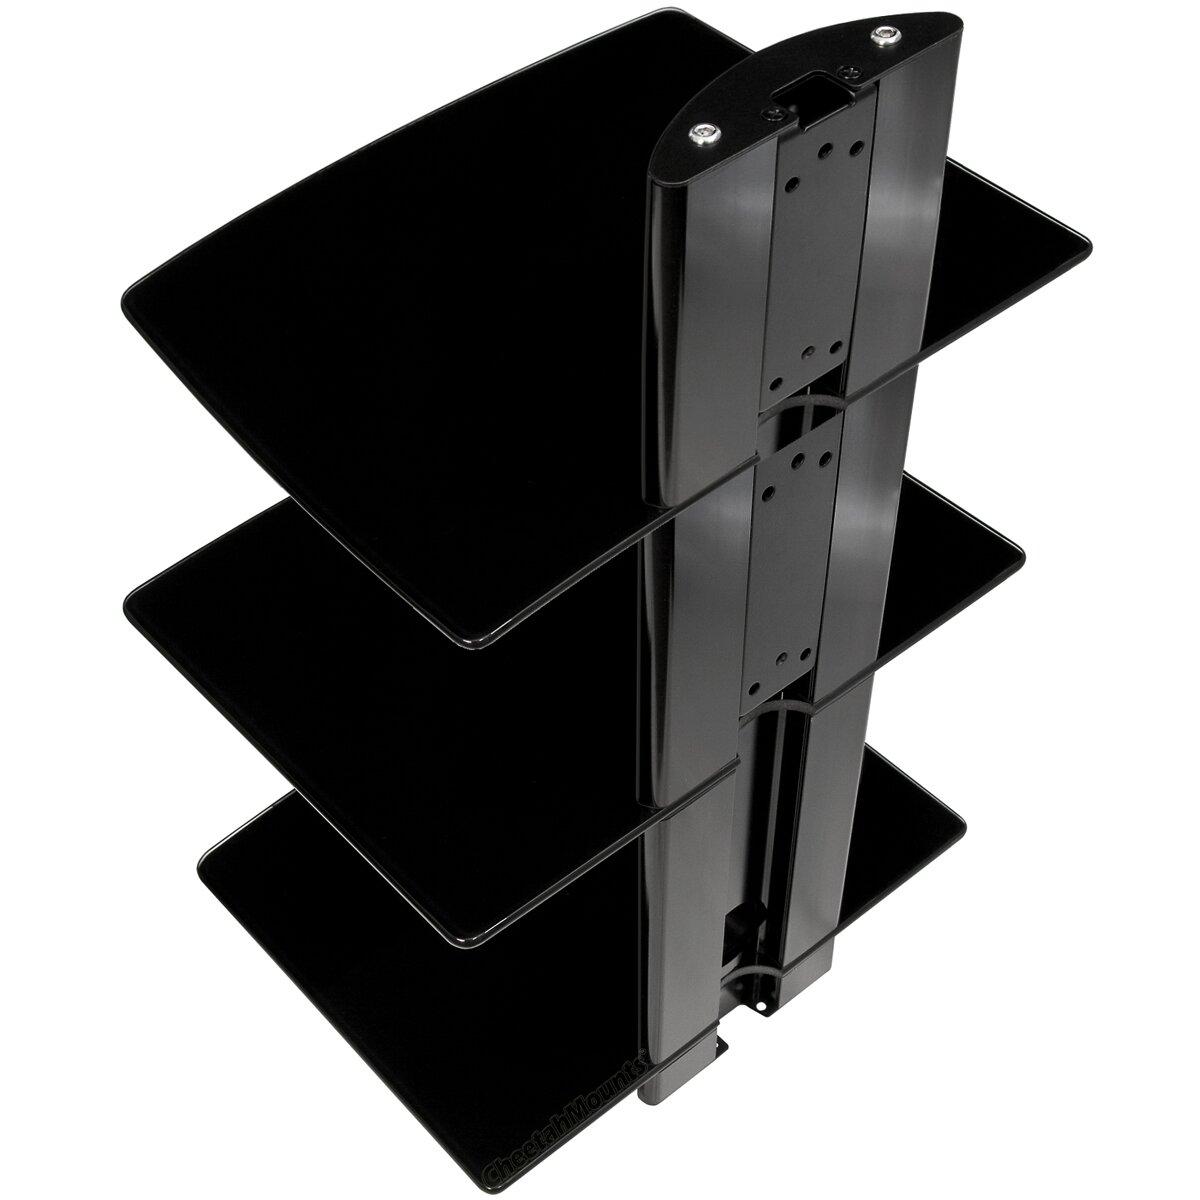 cheetah mounts 3 shelf tv component wall mount shelving. Black Bedroom Furniture Sets. Home Design Ideas